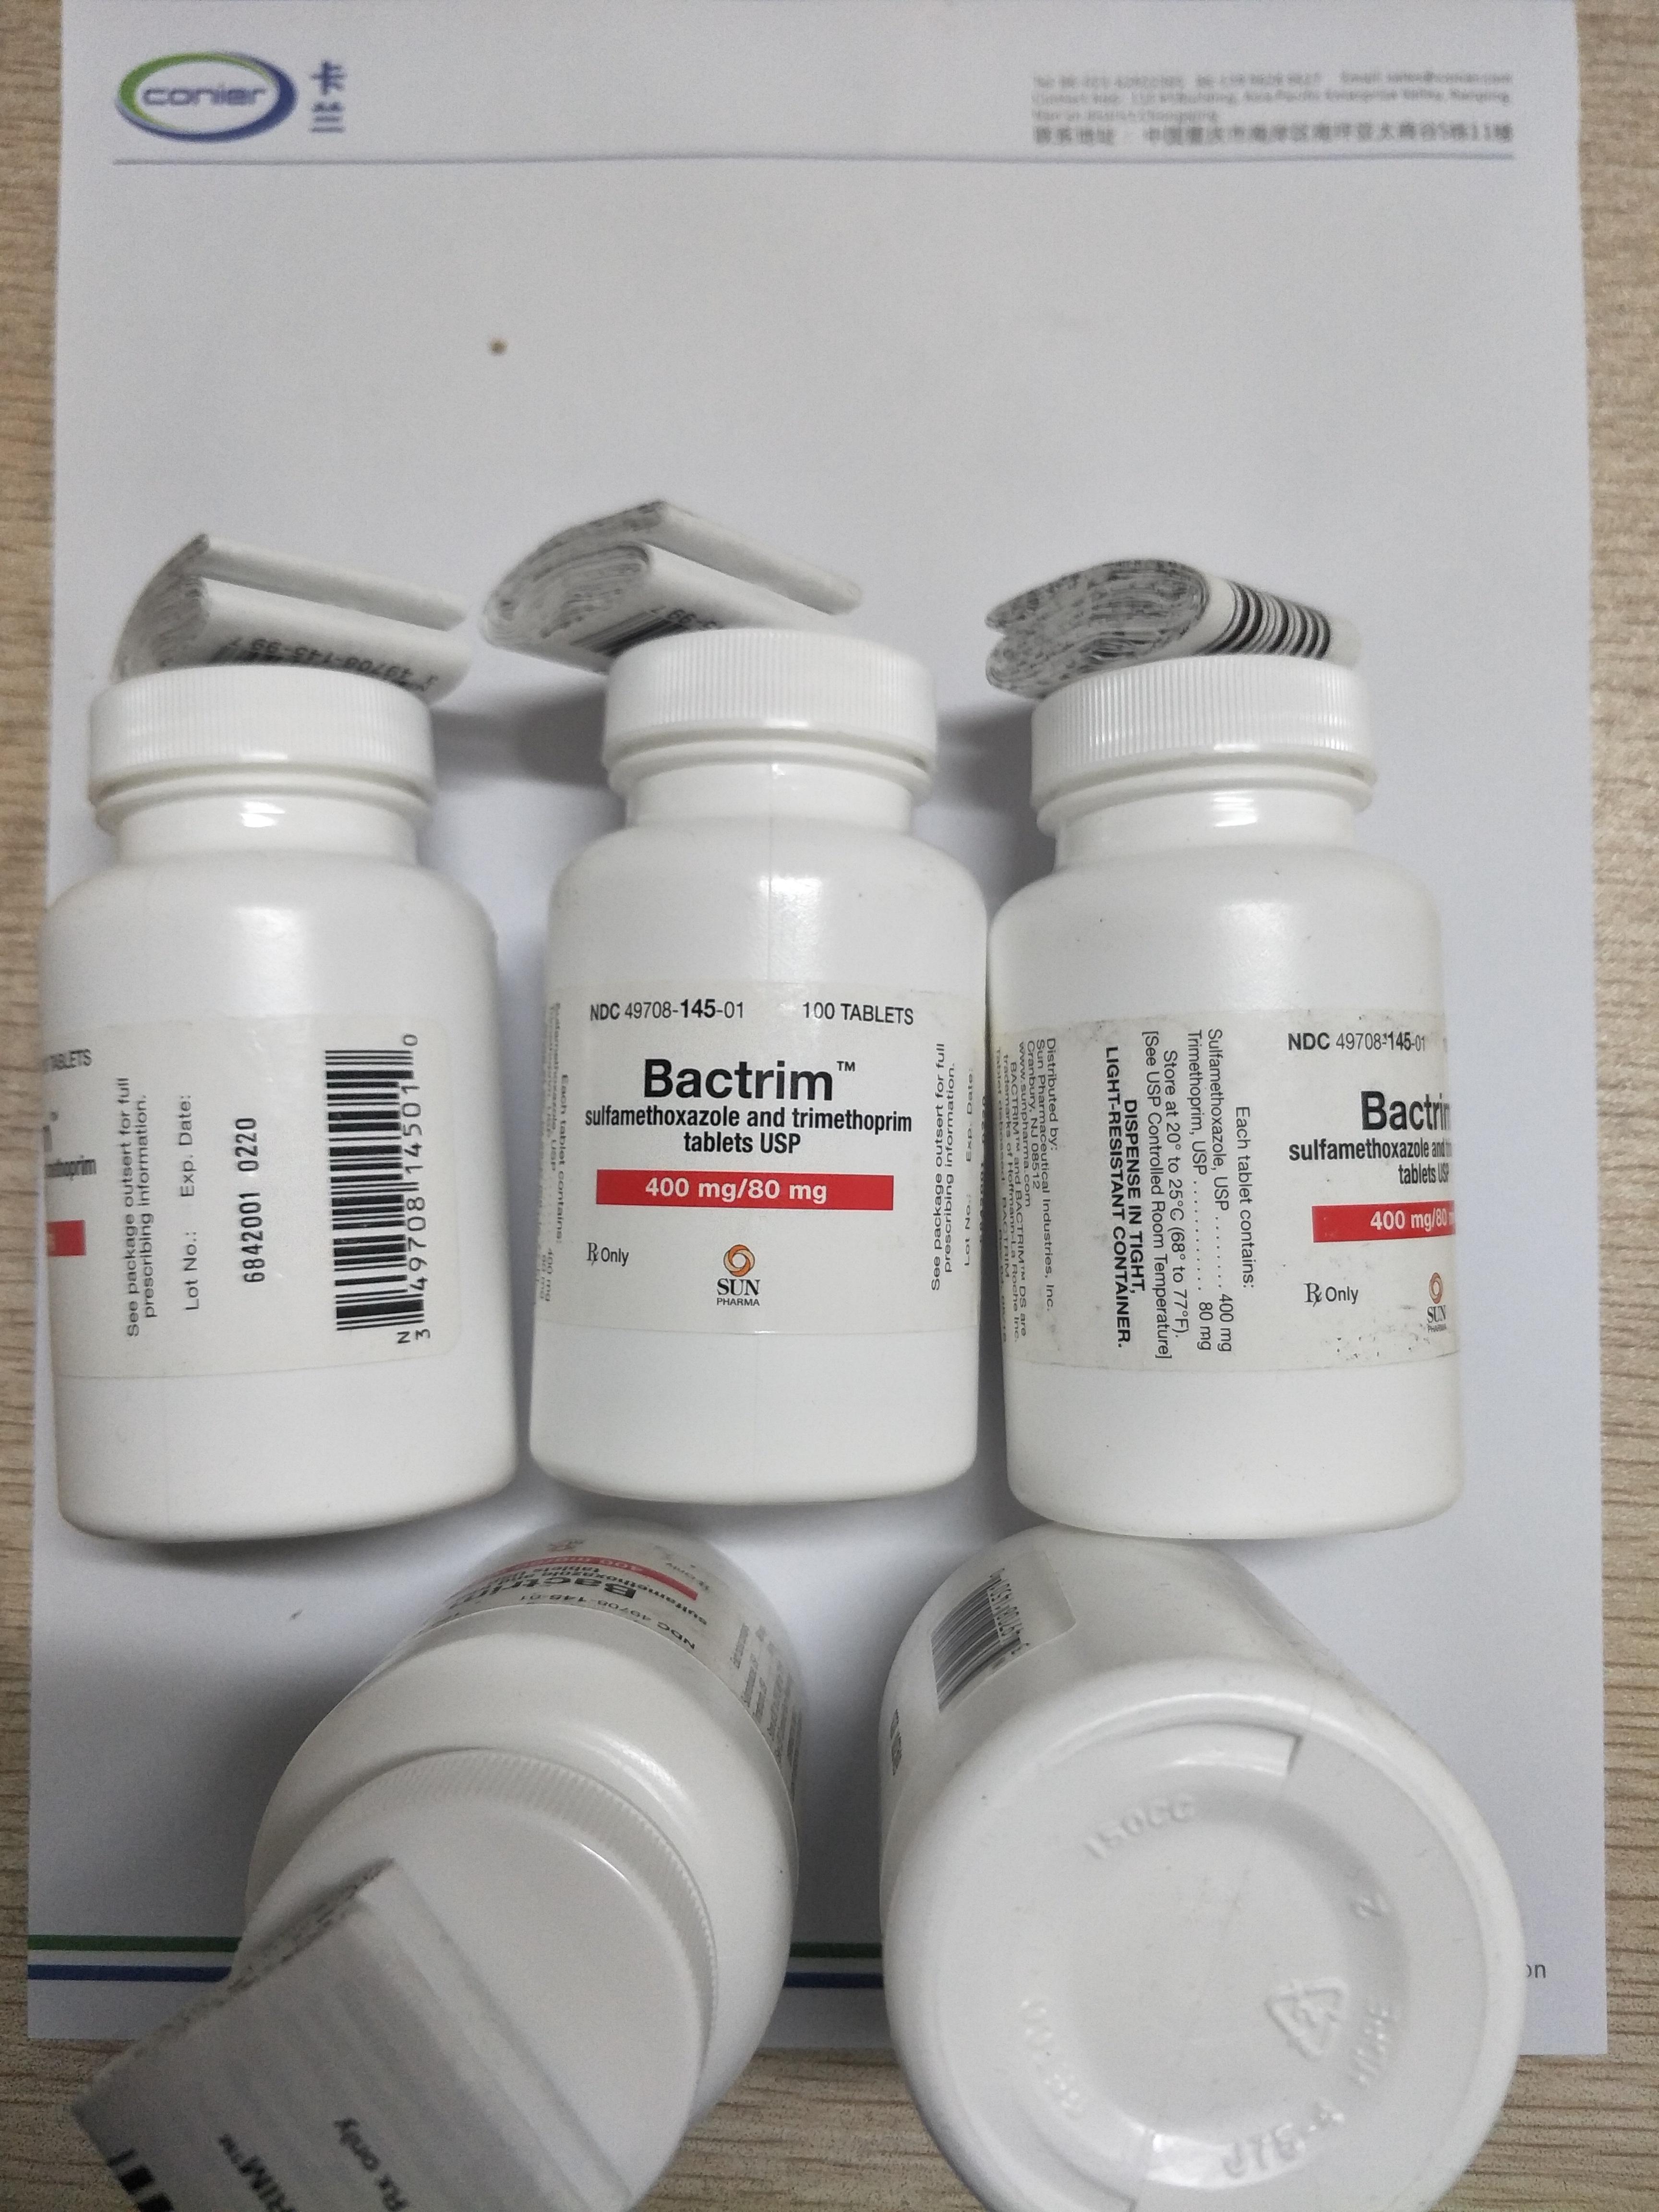 sulfamethoxazole and trimethoprim tablets 参比制剂